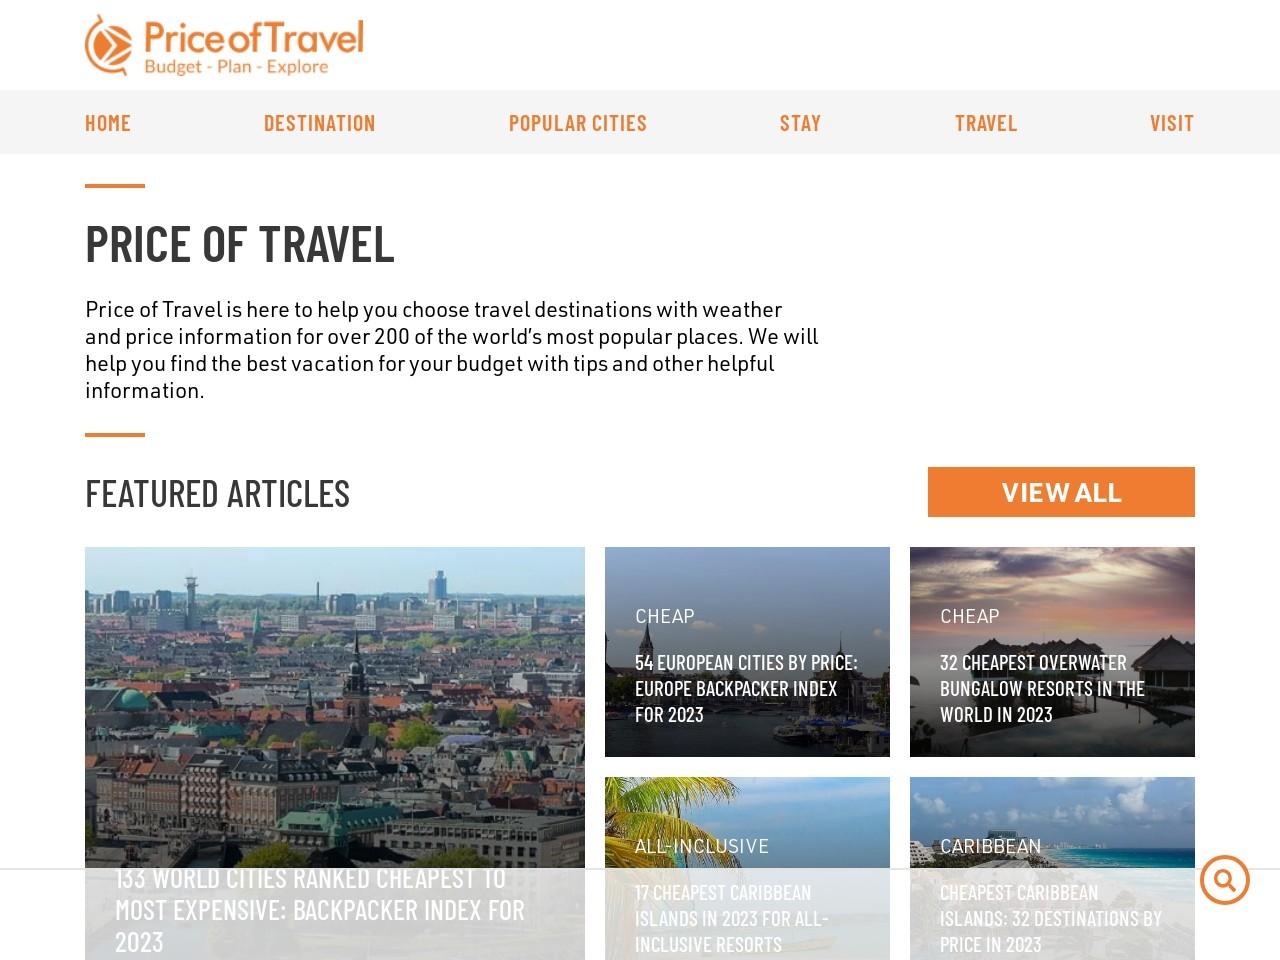 priceoftravel.com